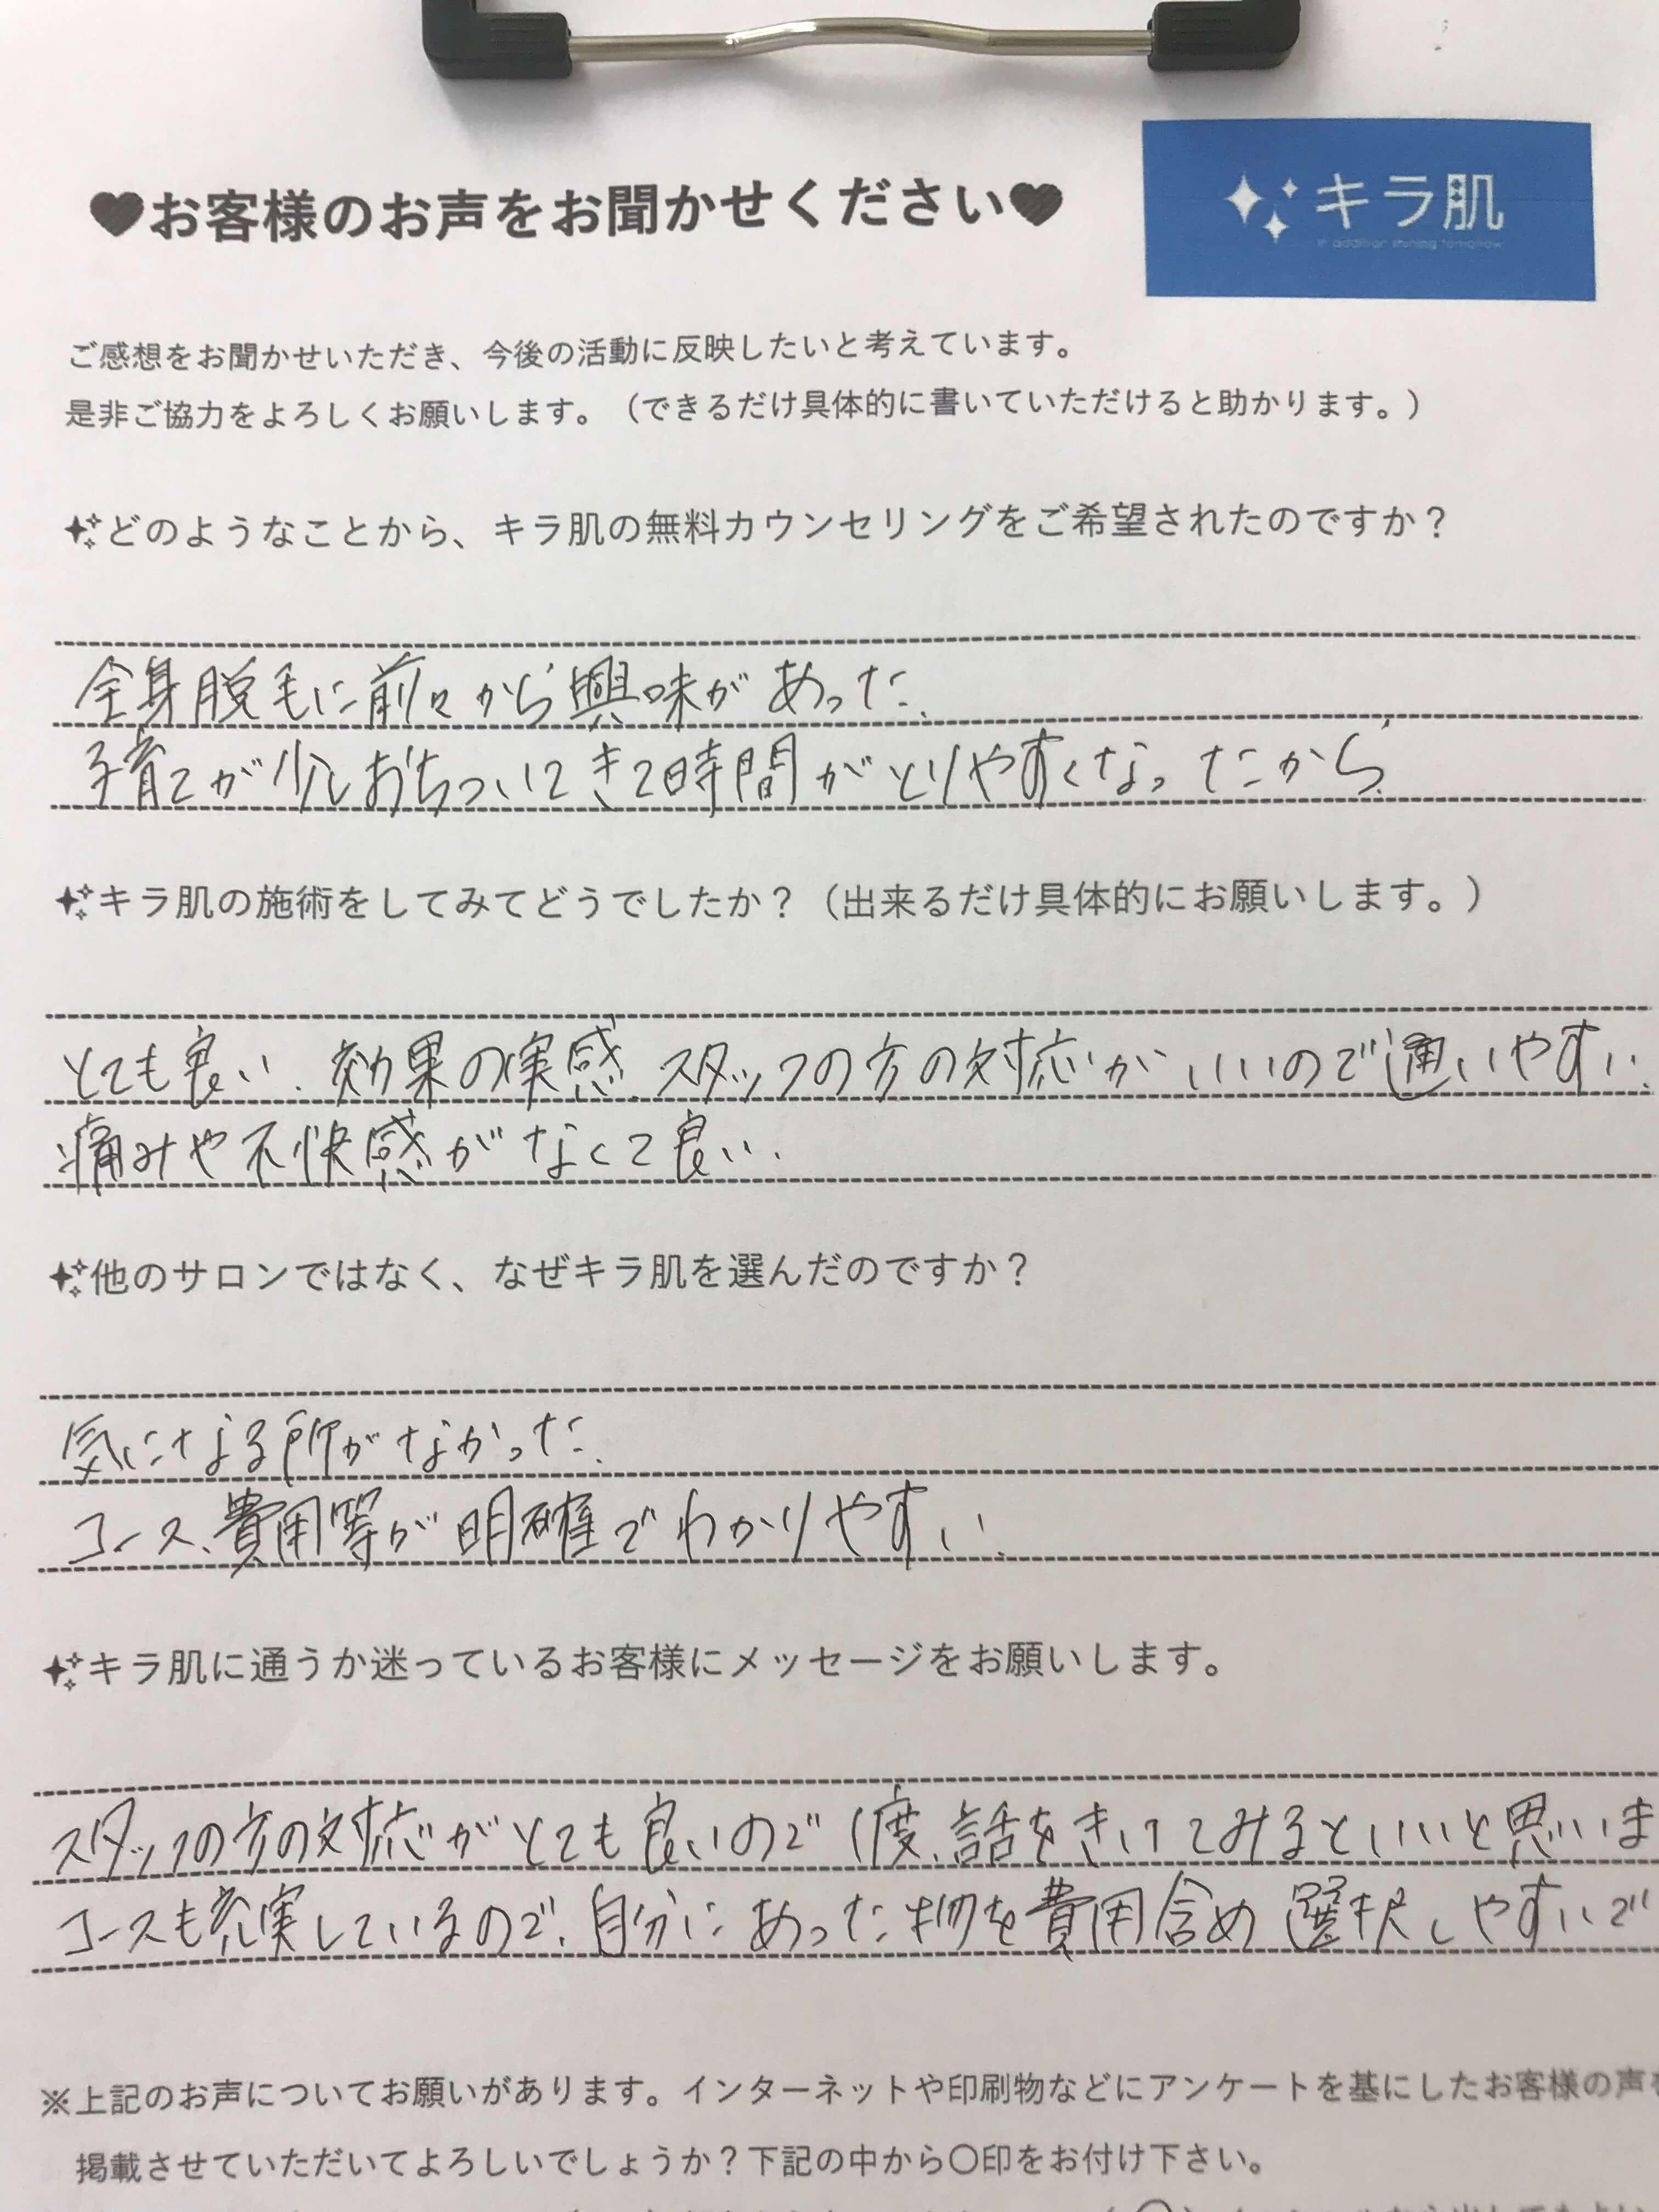 松江 脱毛 キラ肌 口コミ 松江駅付近在住。